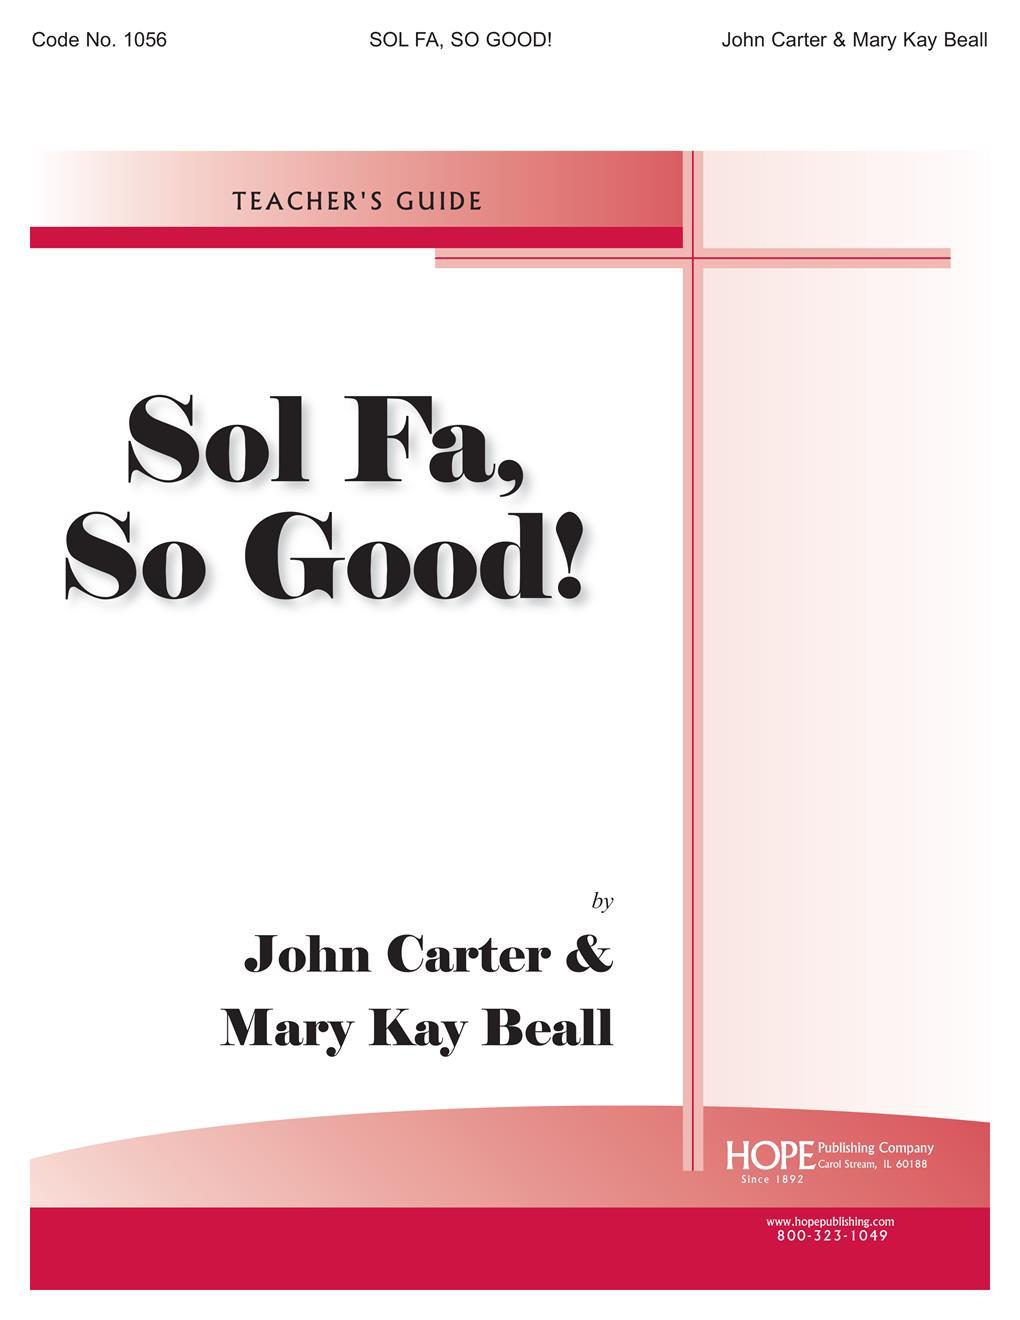 SOL FA, SO GOOD - Cover Image